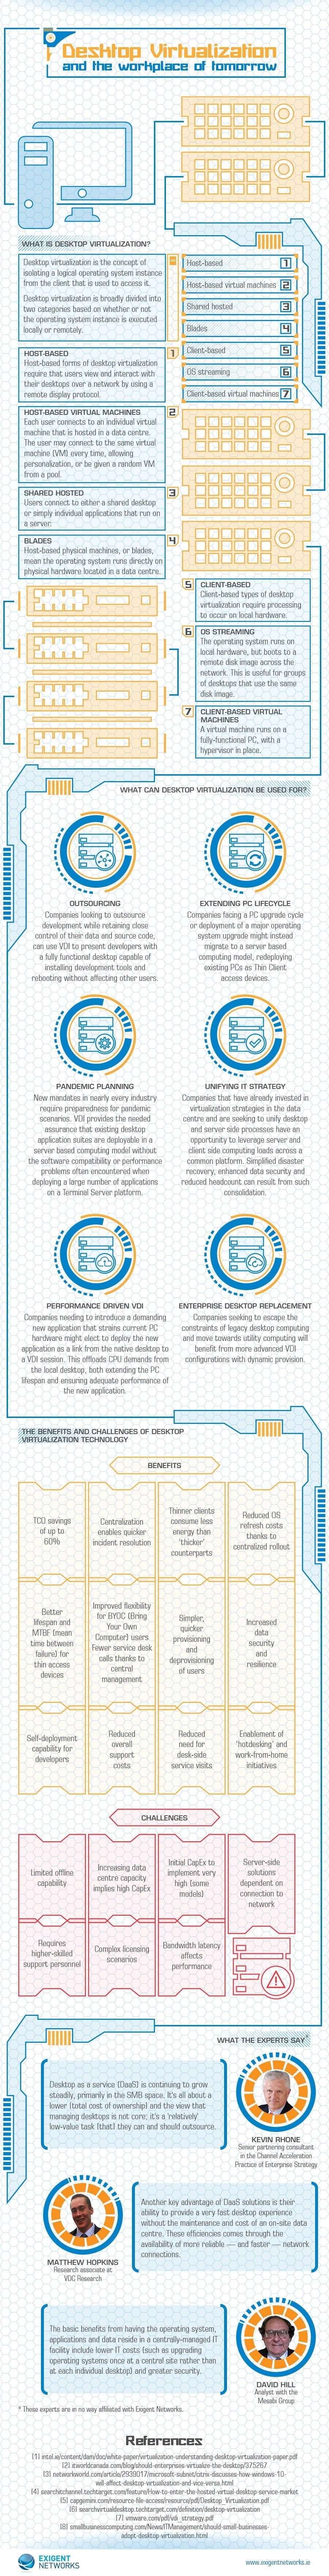 Desktop Virtualization – Infographic